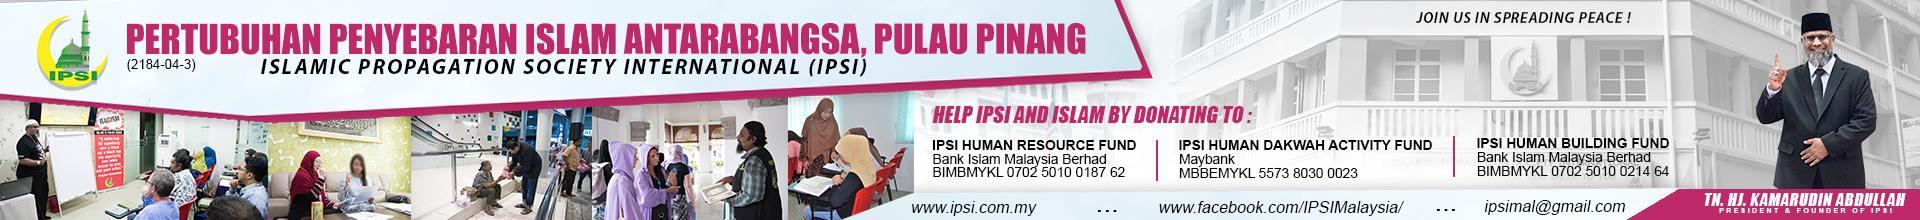 IPSI > Islamic Propagation Society International